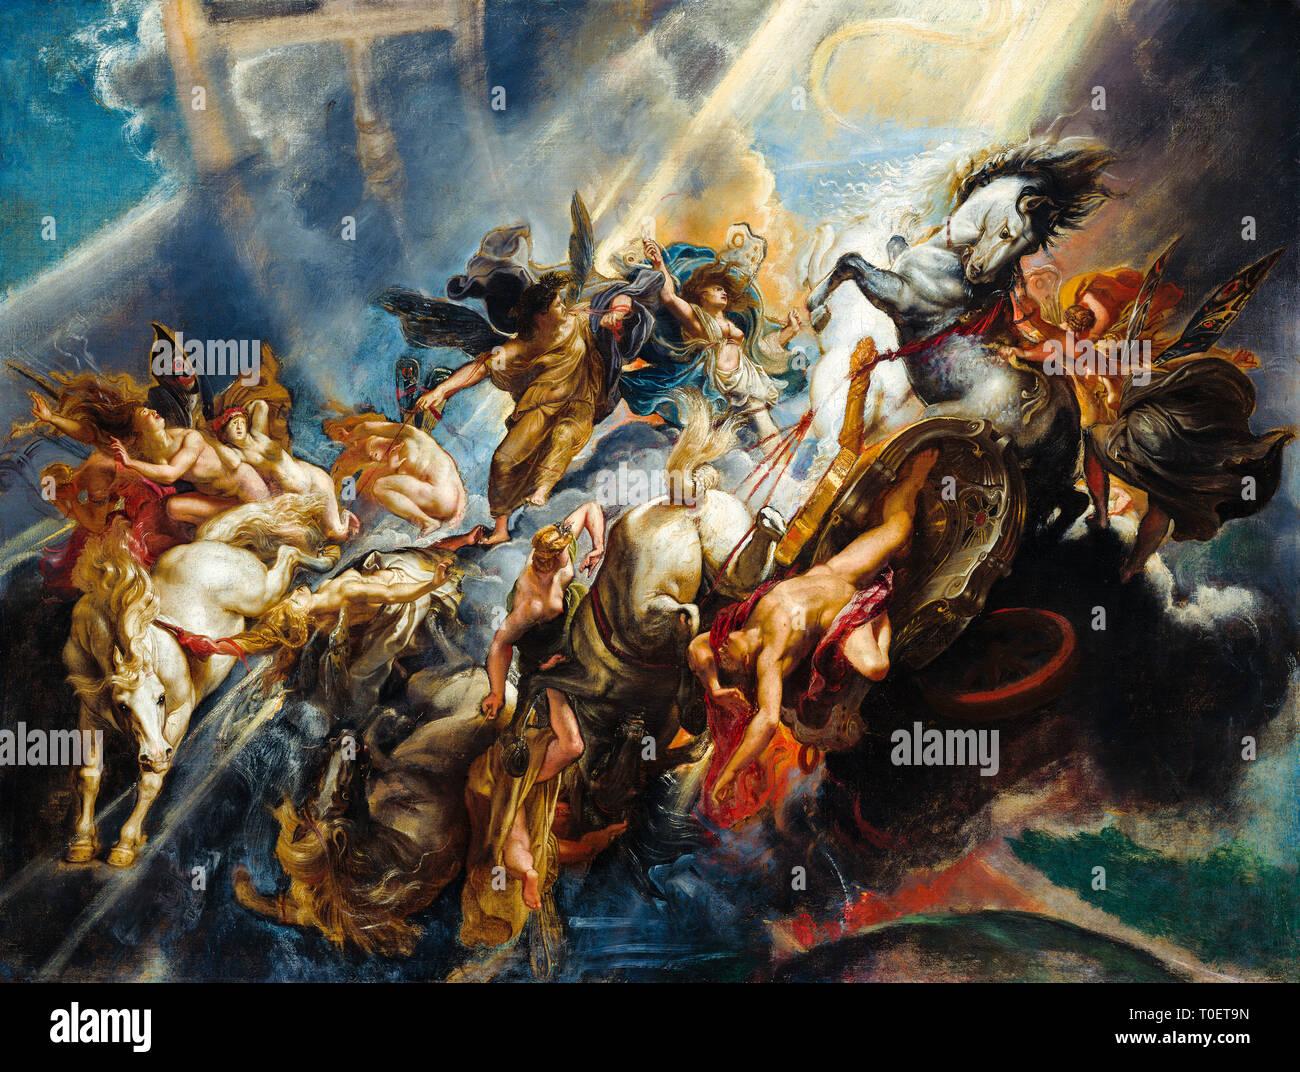 Sir Peter Paul Rubens, The Fall of Phaeton, painting, c. 1604-1605 - Stock Image